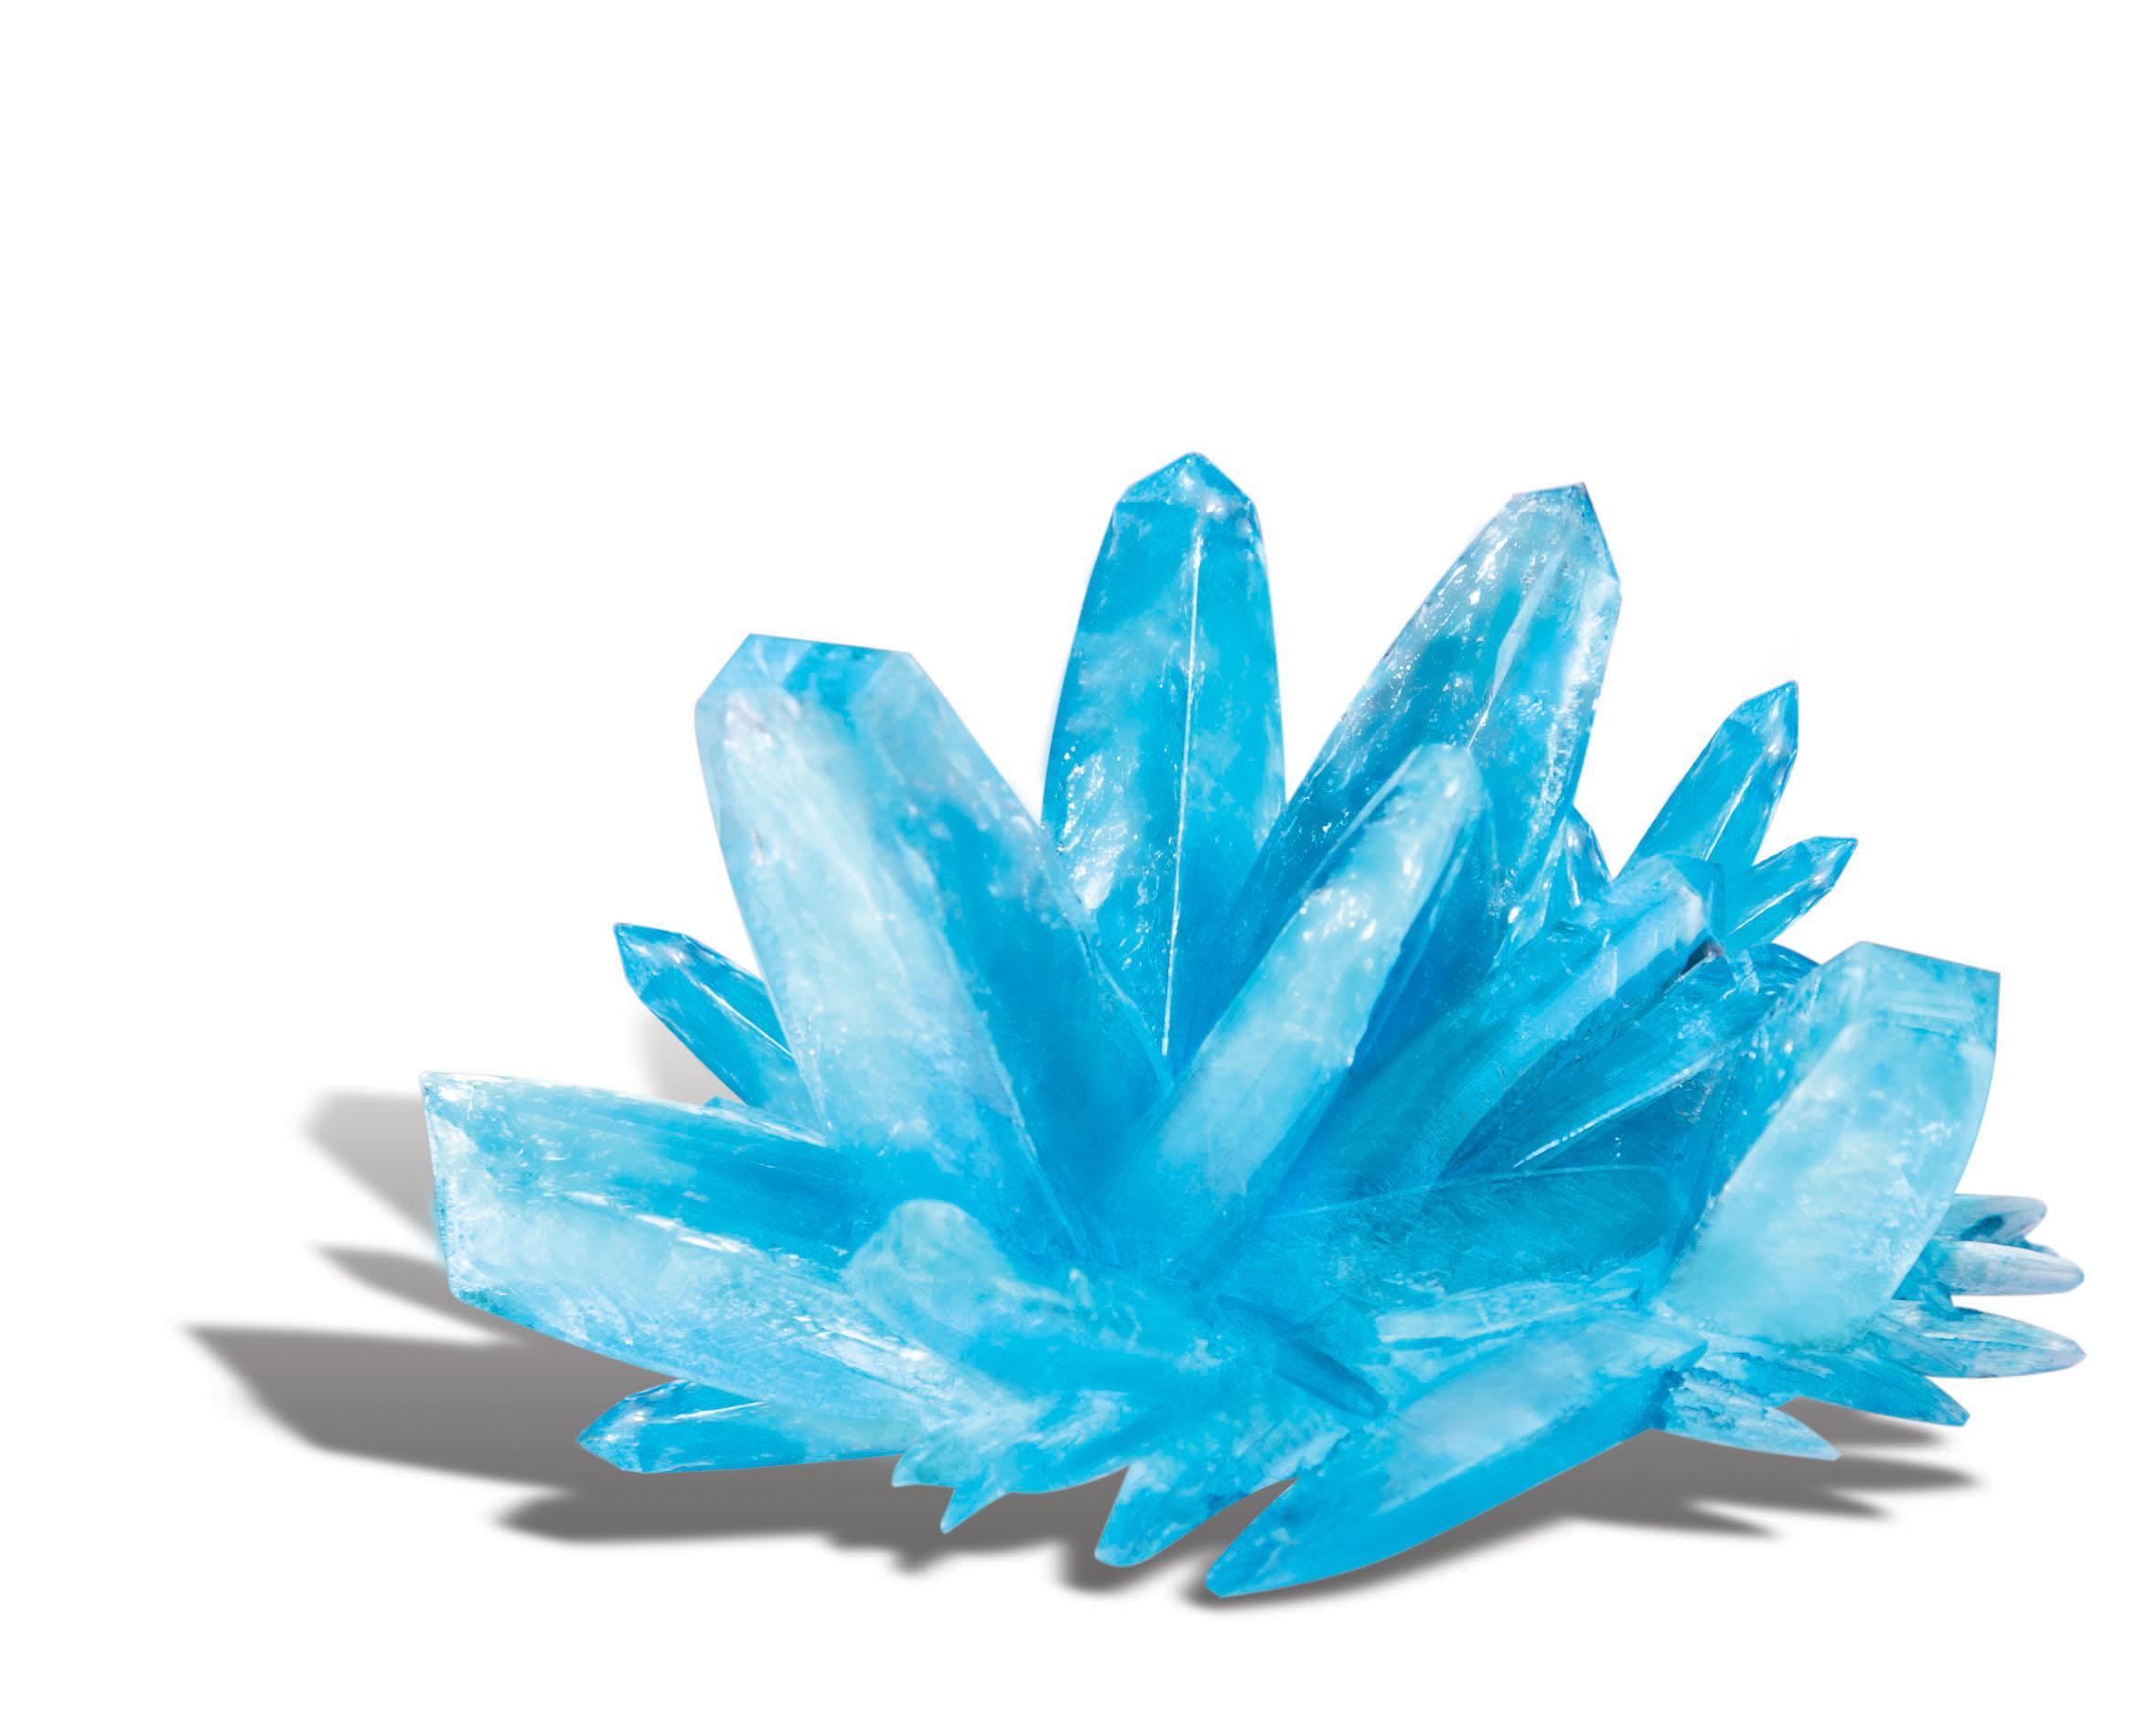 FM120039130000 4M Crystal - Crystal Growing (2)